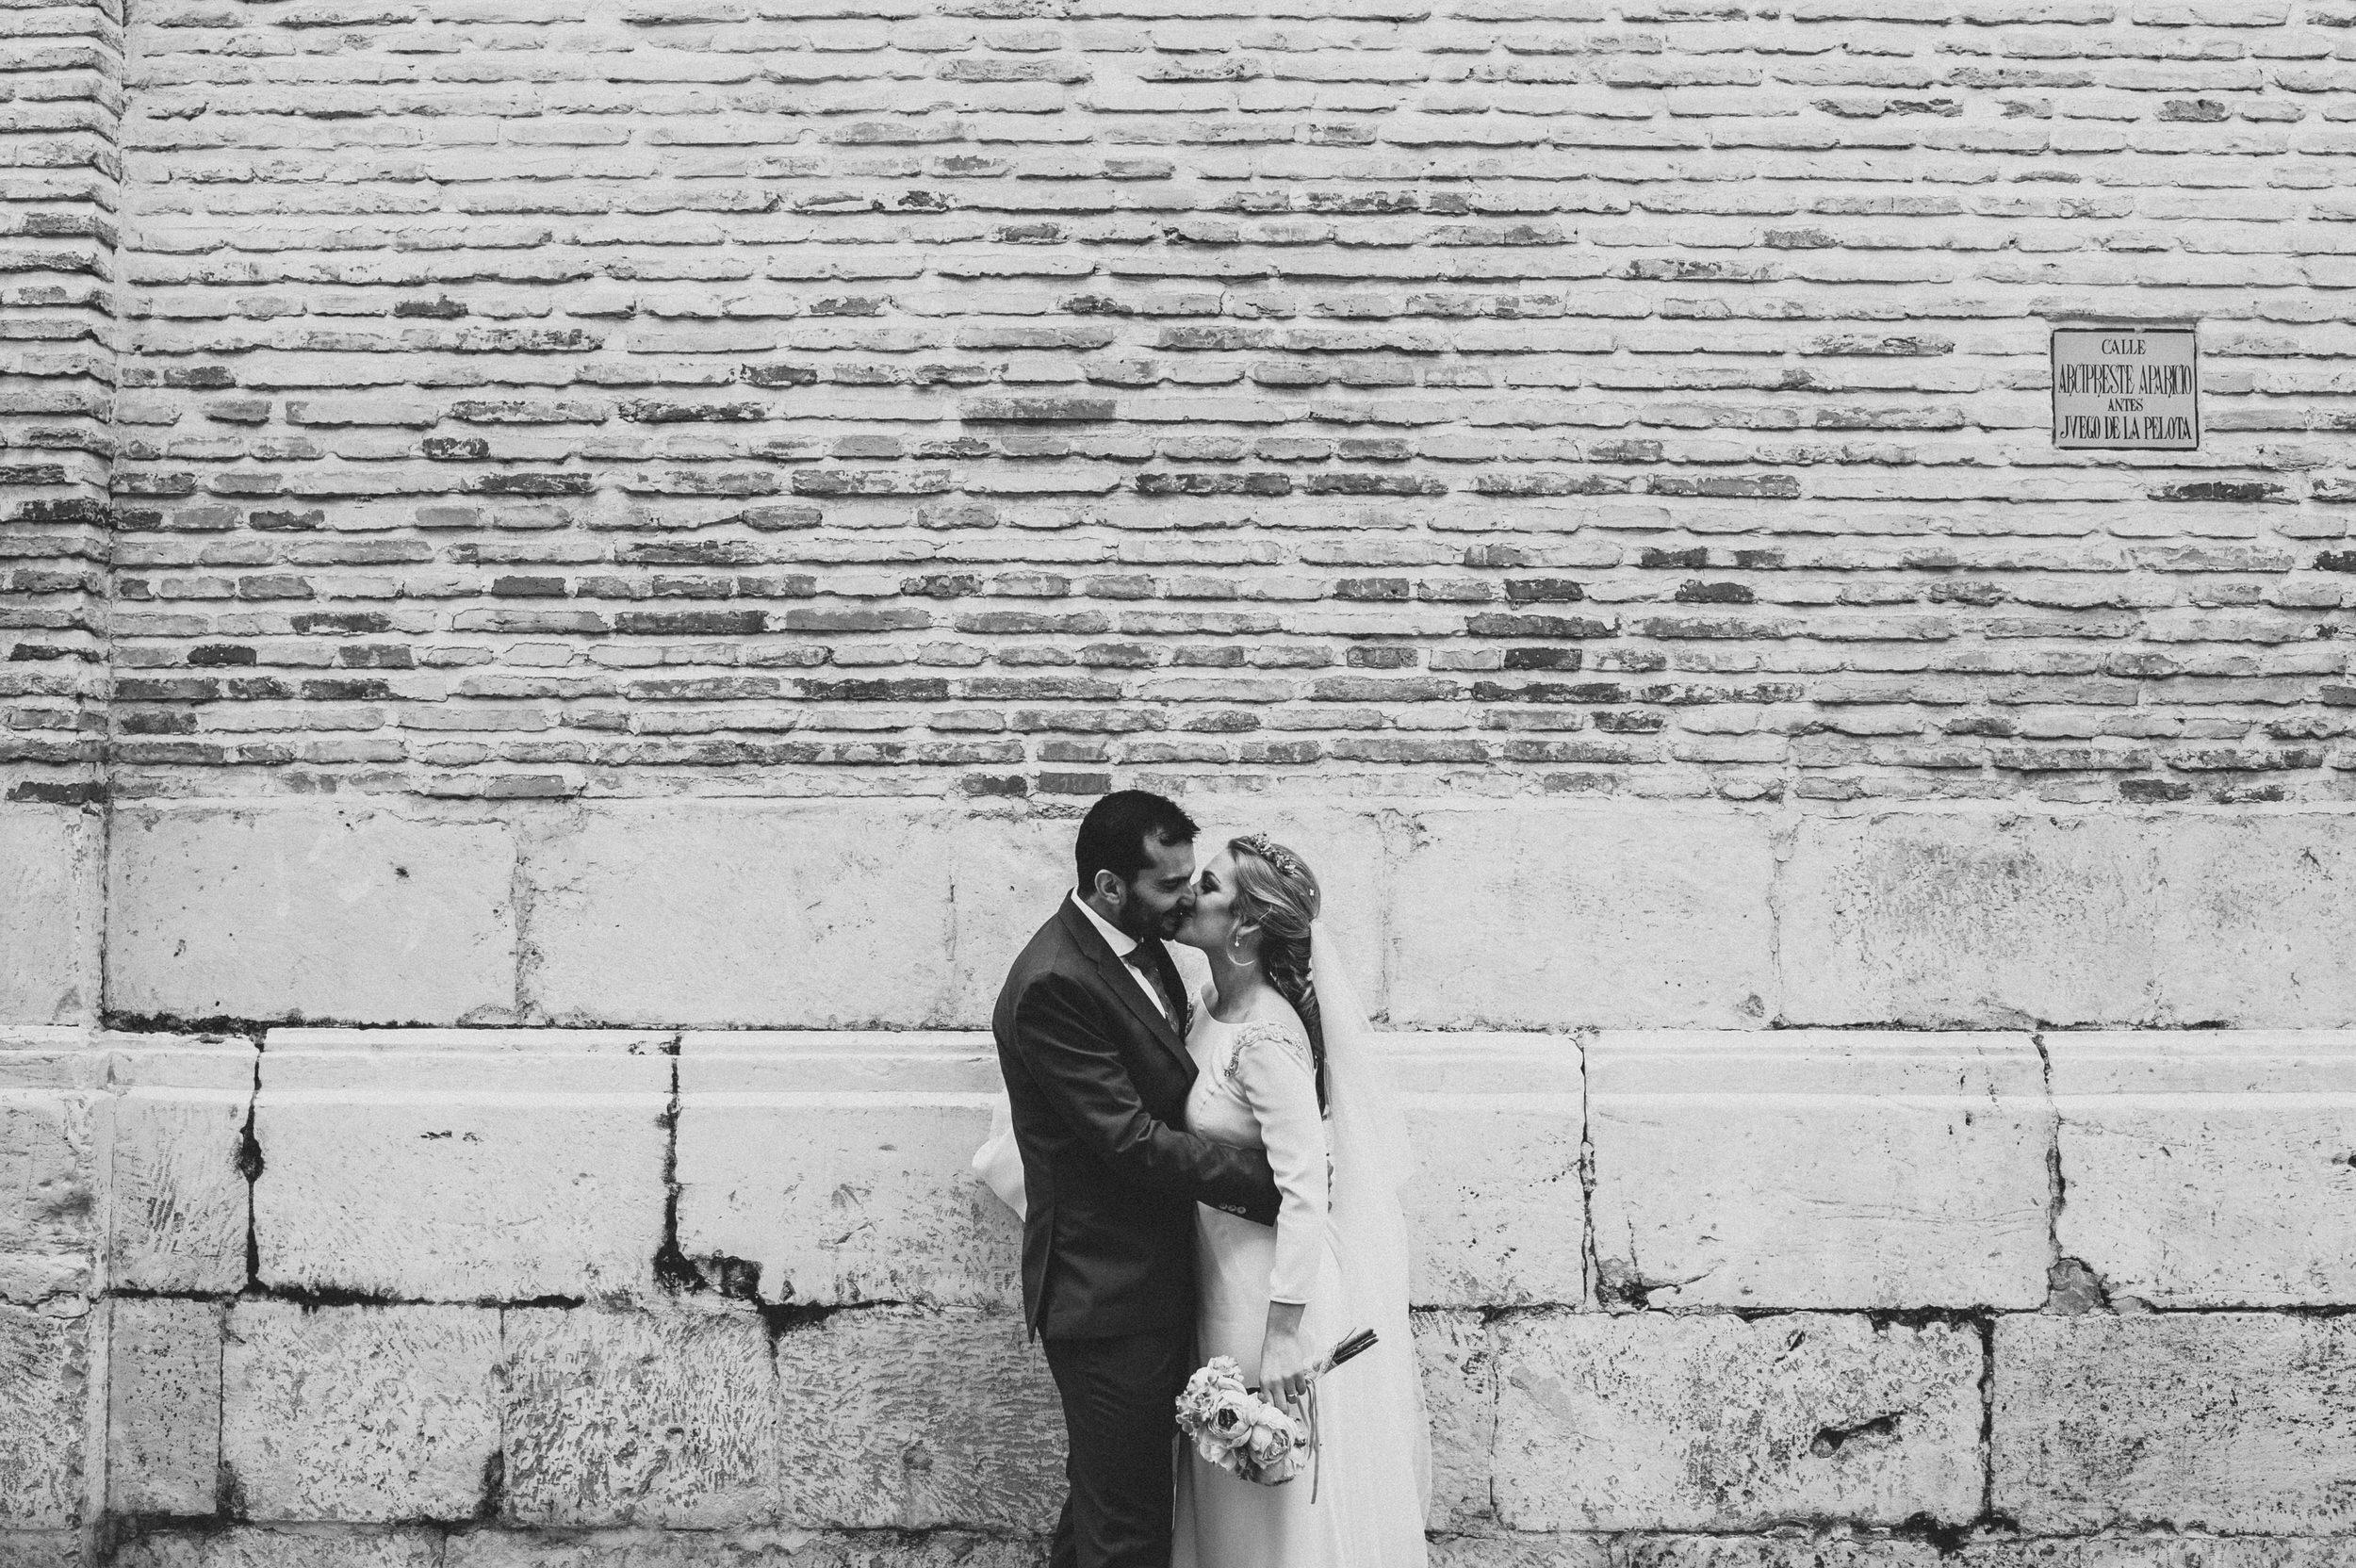 Cristina & Jero - Boda en Ecija - Iglesia Santa Ana - Fotógrafo Andrés Amarillo (41).JPG